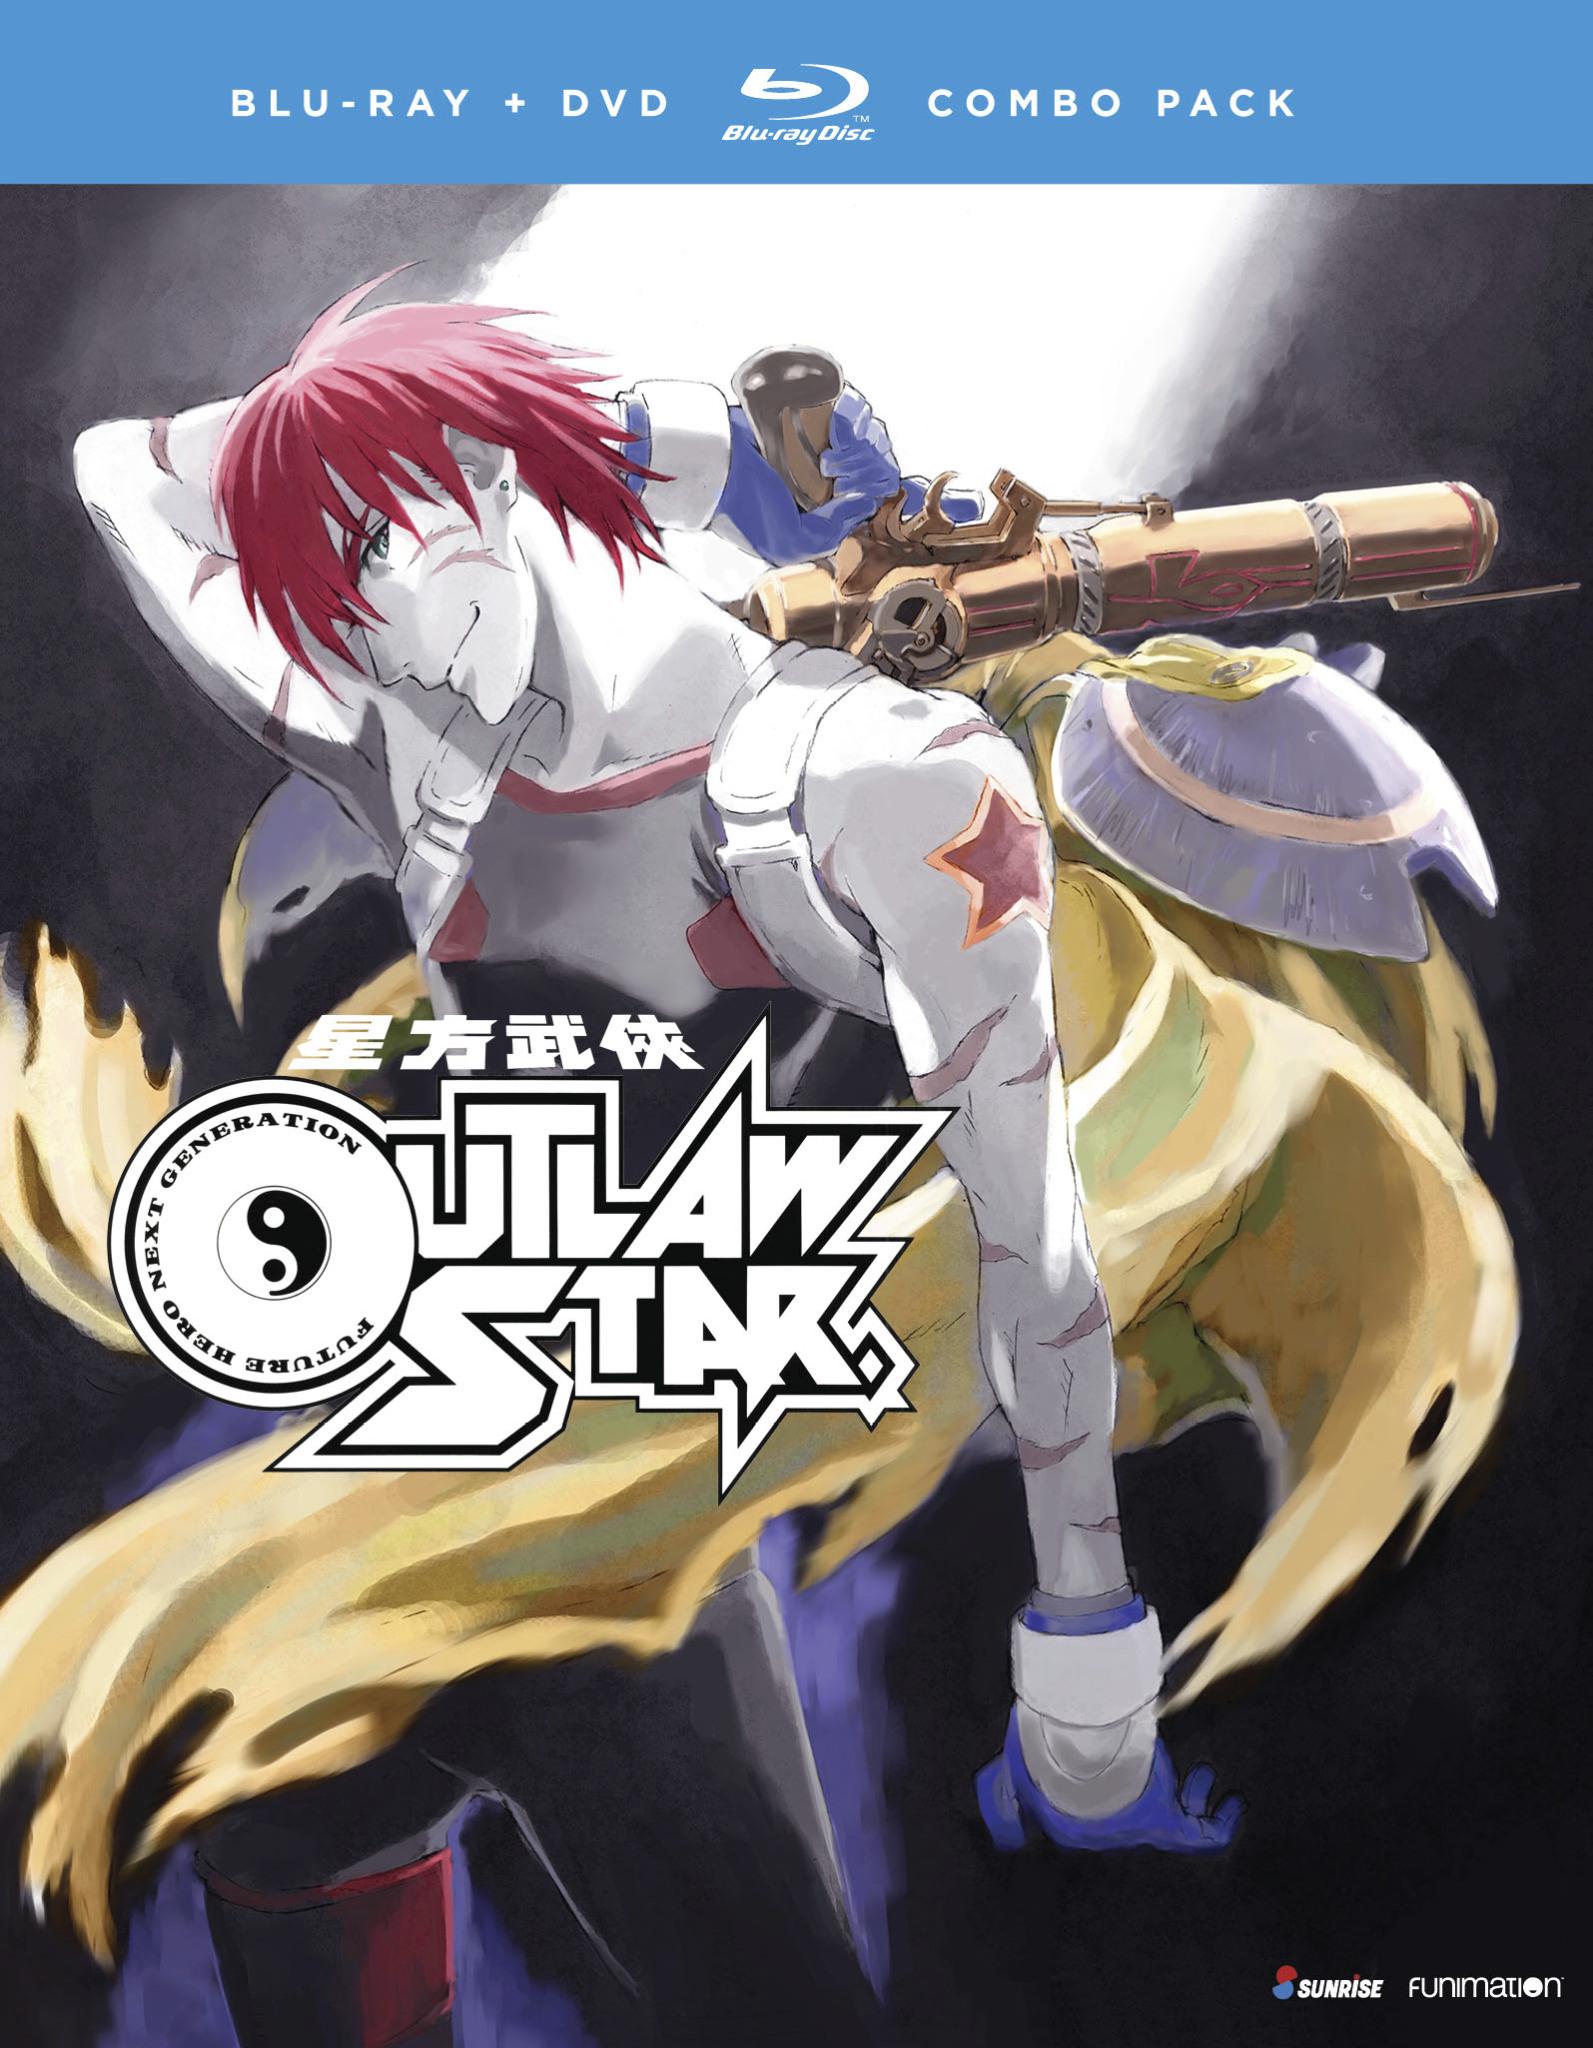 Outlaw Star Blu-ray/DVD